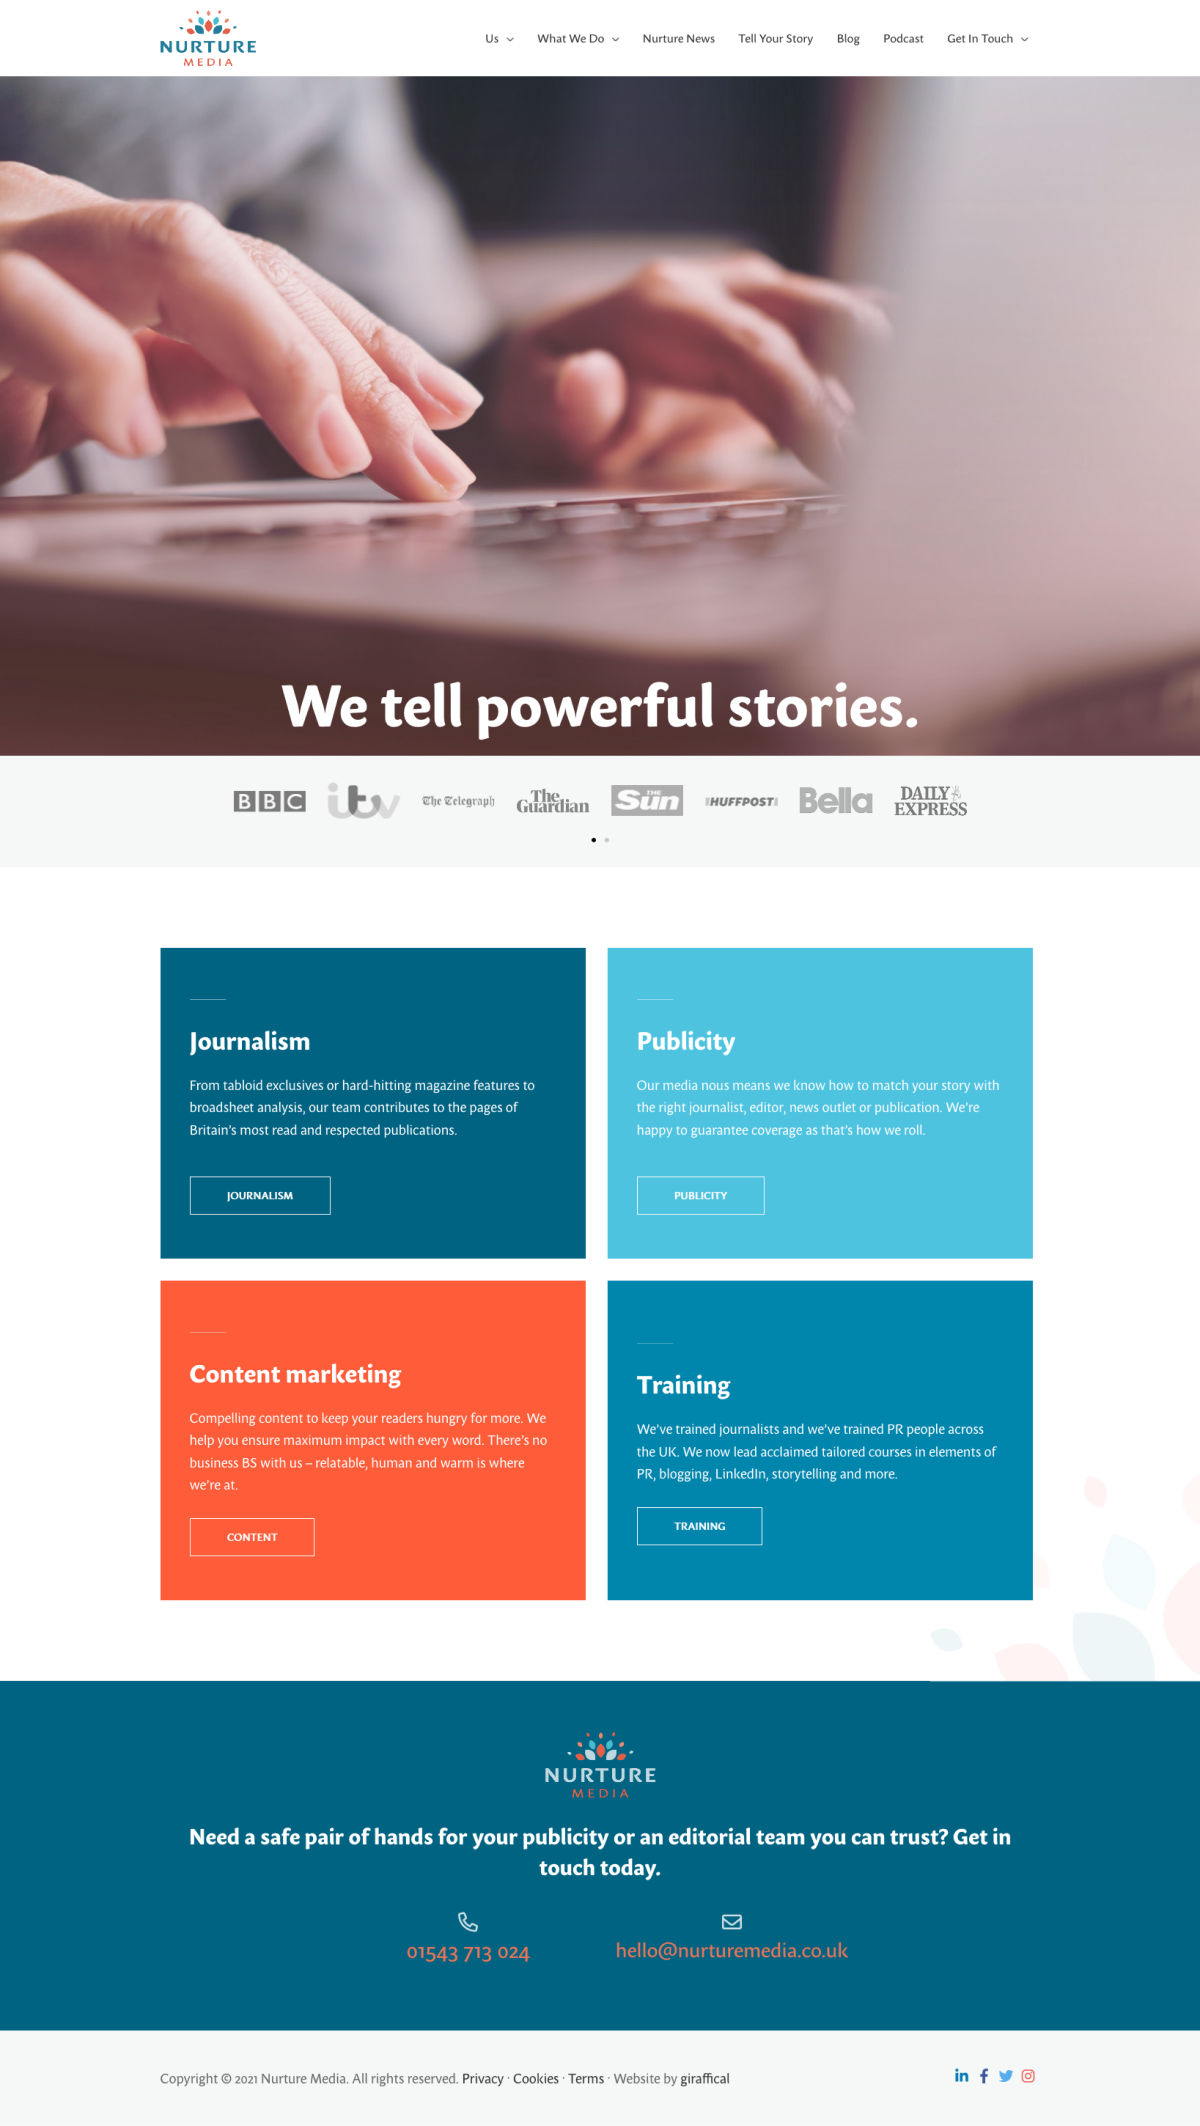 PR Publicity Agency Website Design - Nurture Media - Home Page